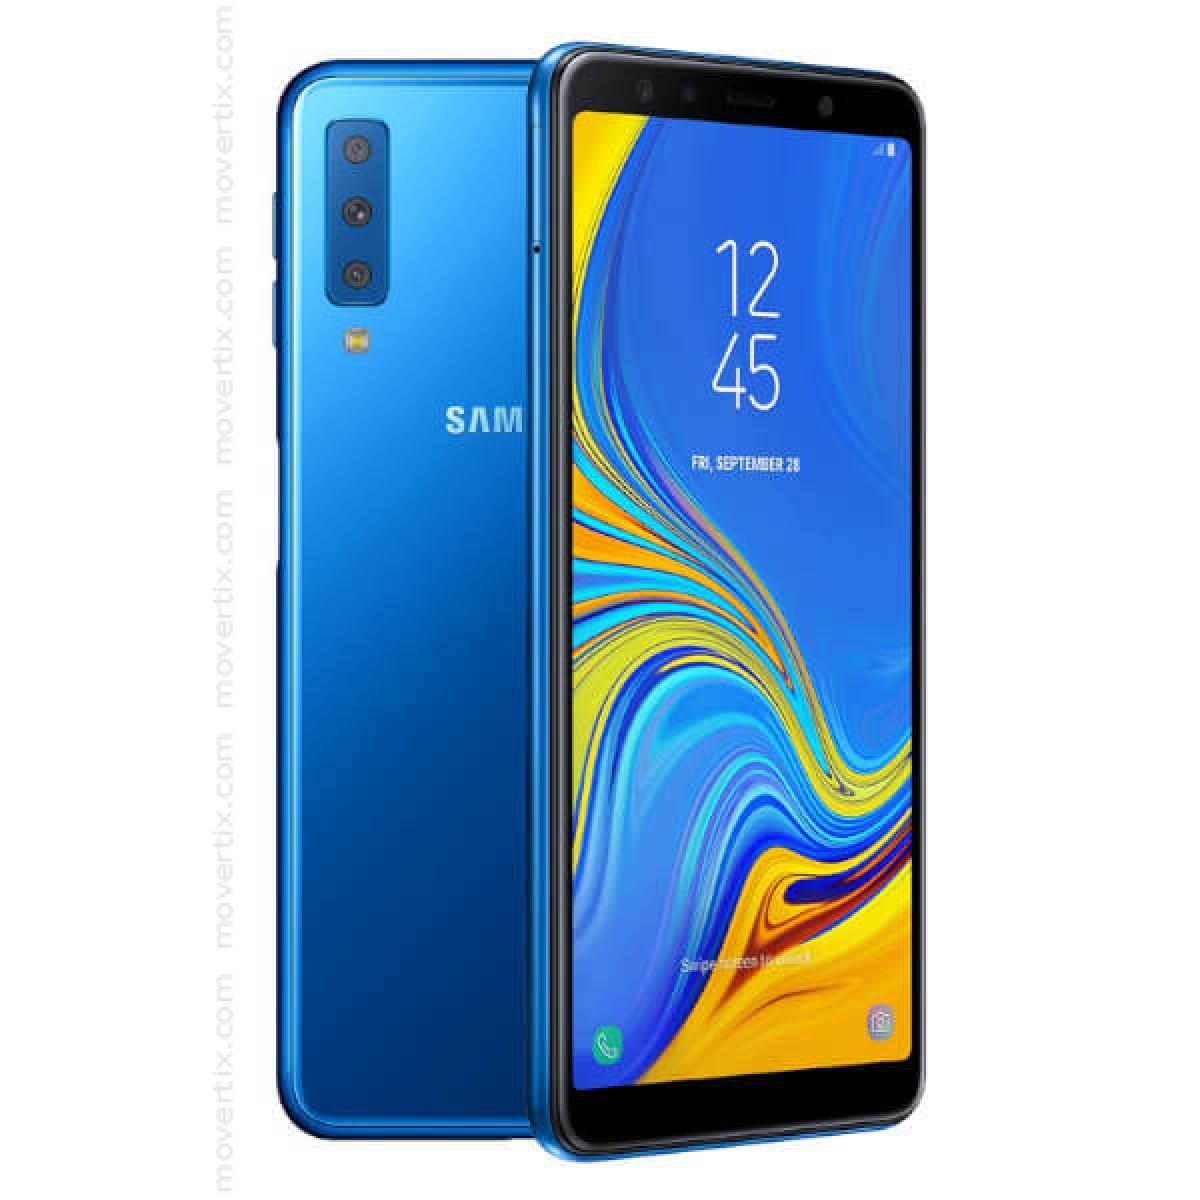 samsung galaxy a7 2018 dual sim in blau sm a750f ds. Black Bedroom Furniture Sets. Home Design Ideas